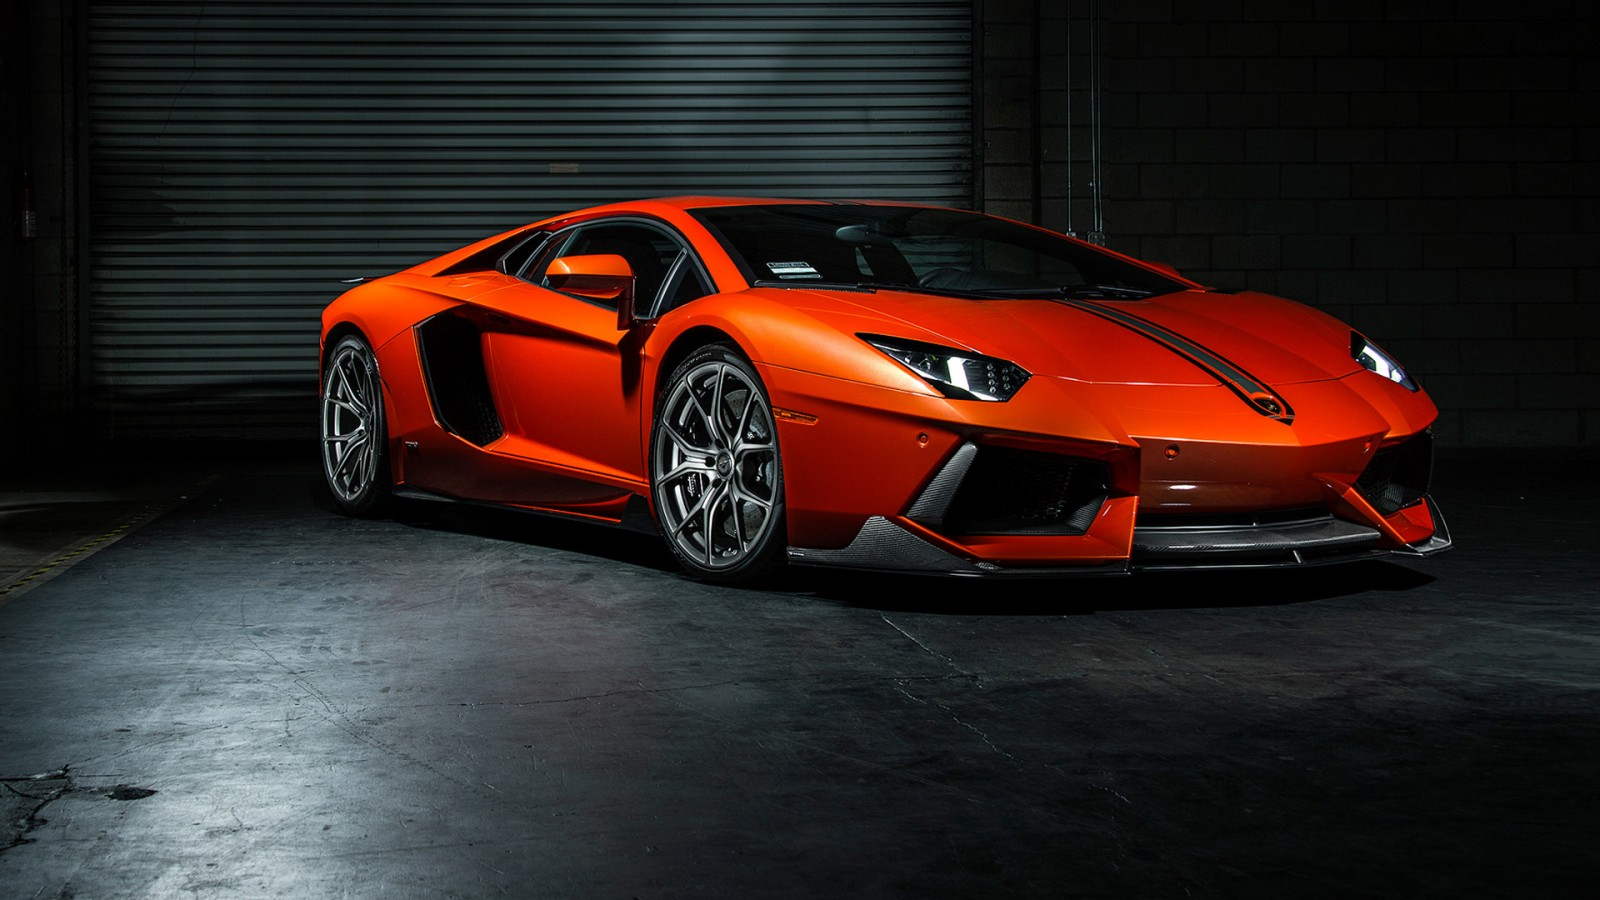 Black Lamborghini Hd Wallpapers 2015 Vorsteiner Lamborghini Aventador Coupe Wallpaper Hd